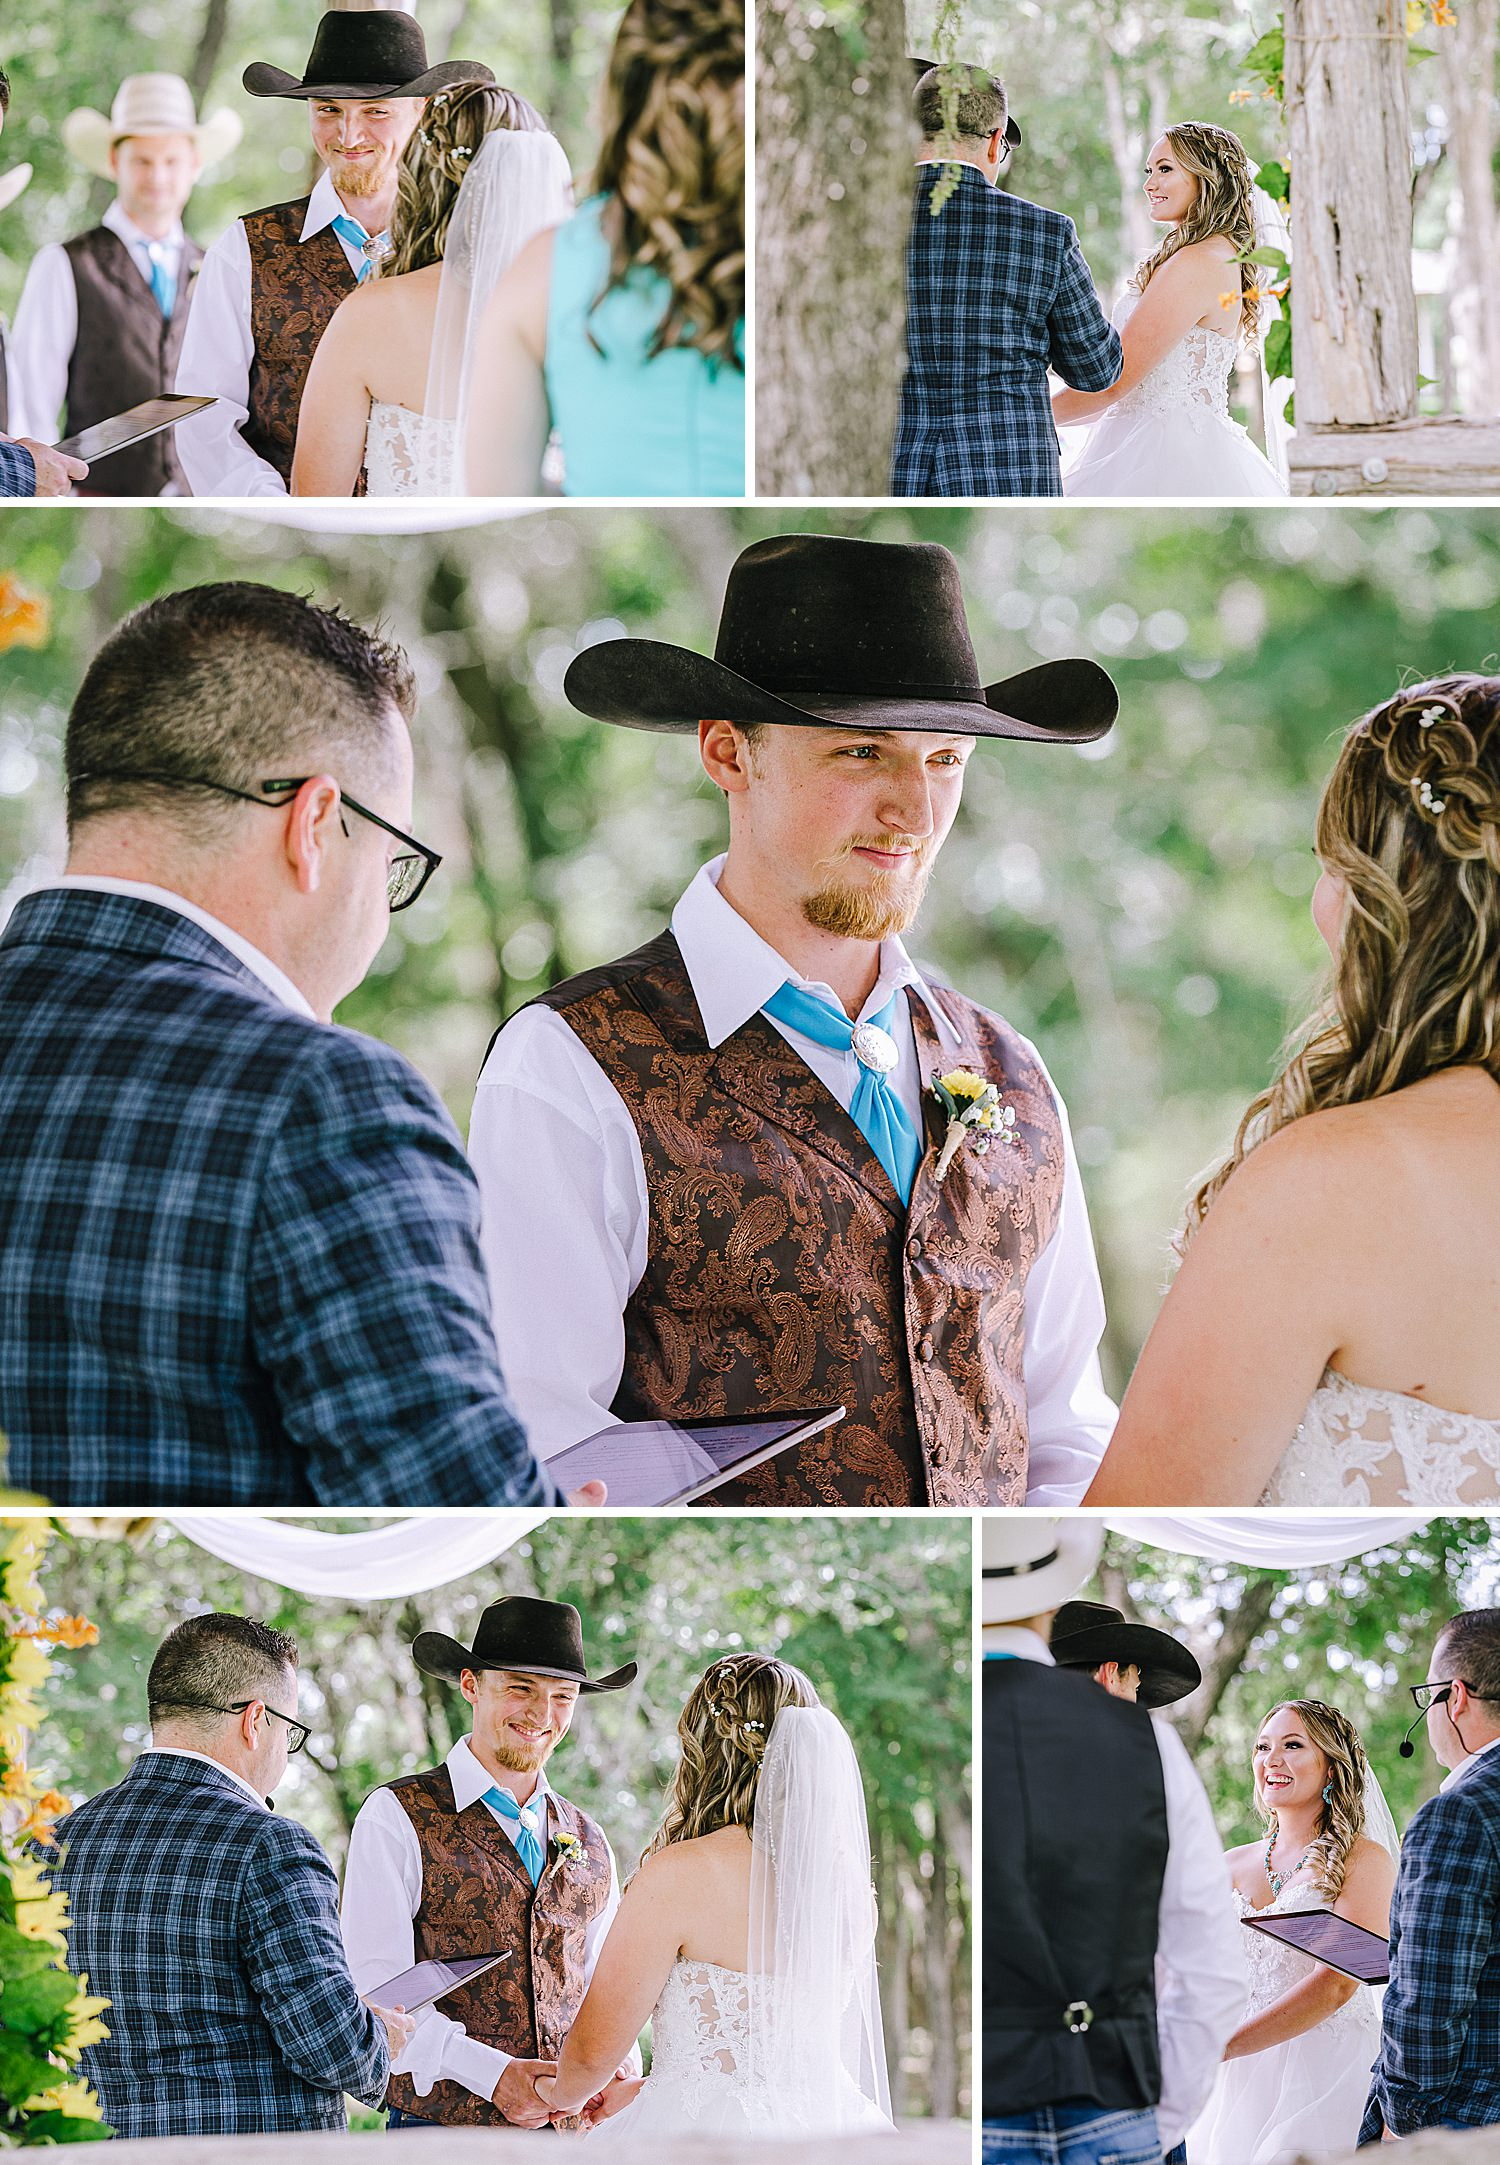 Carly-Barton-Photography-Old-Town-Texas-Rustic-Wedding-Photos-Sunflowers-Boots-Kyle-Texas_0041.jpg